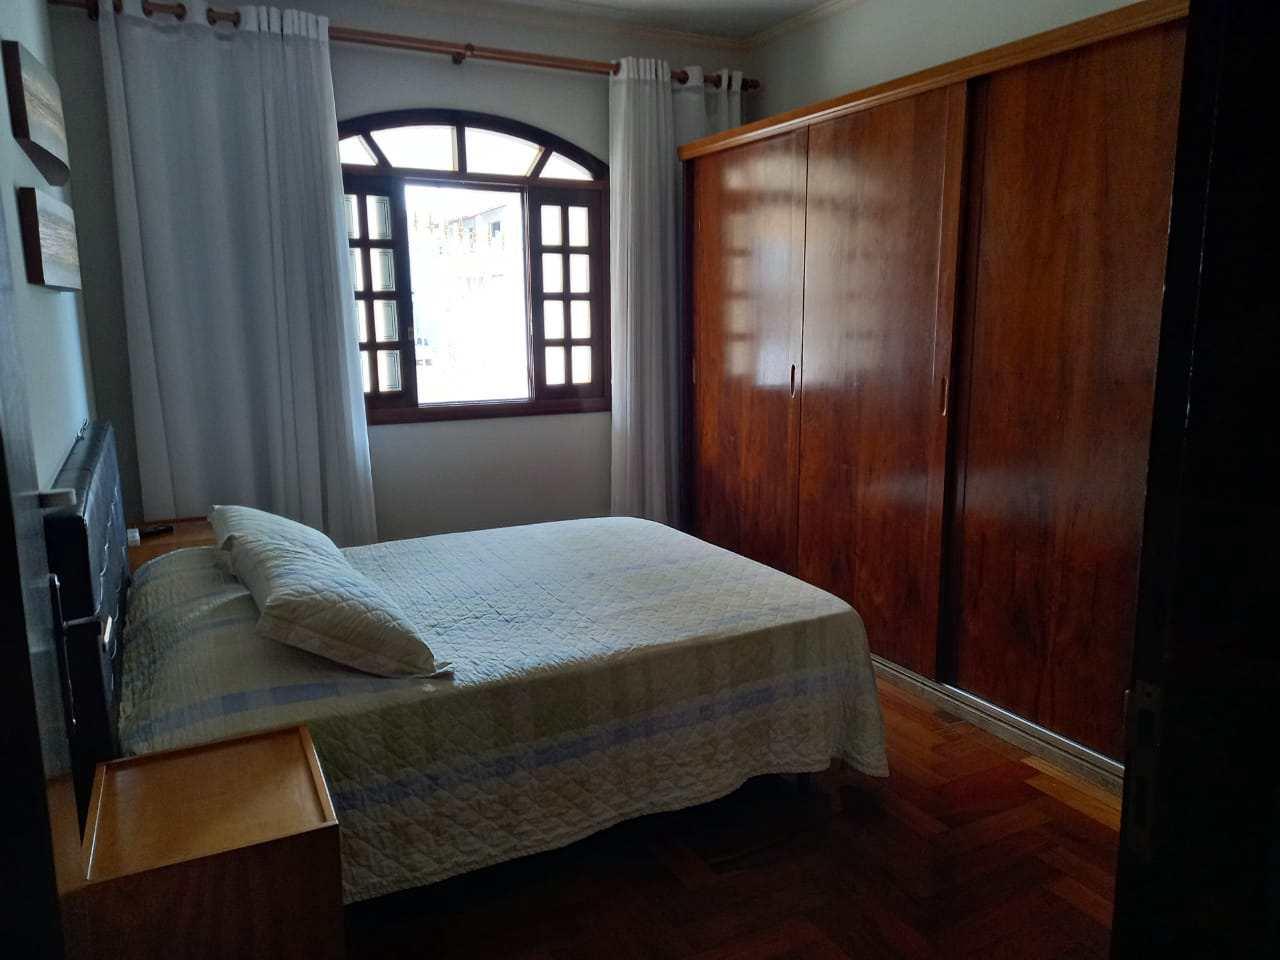 Casa com 3 dorms, Fernandes, Santa Rita do Sapucaí - R$ 430 mil, Cod: 46